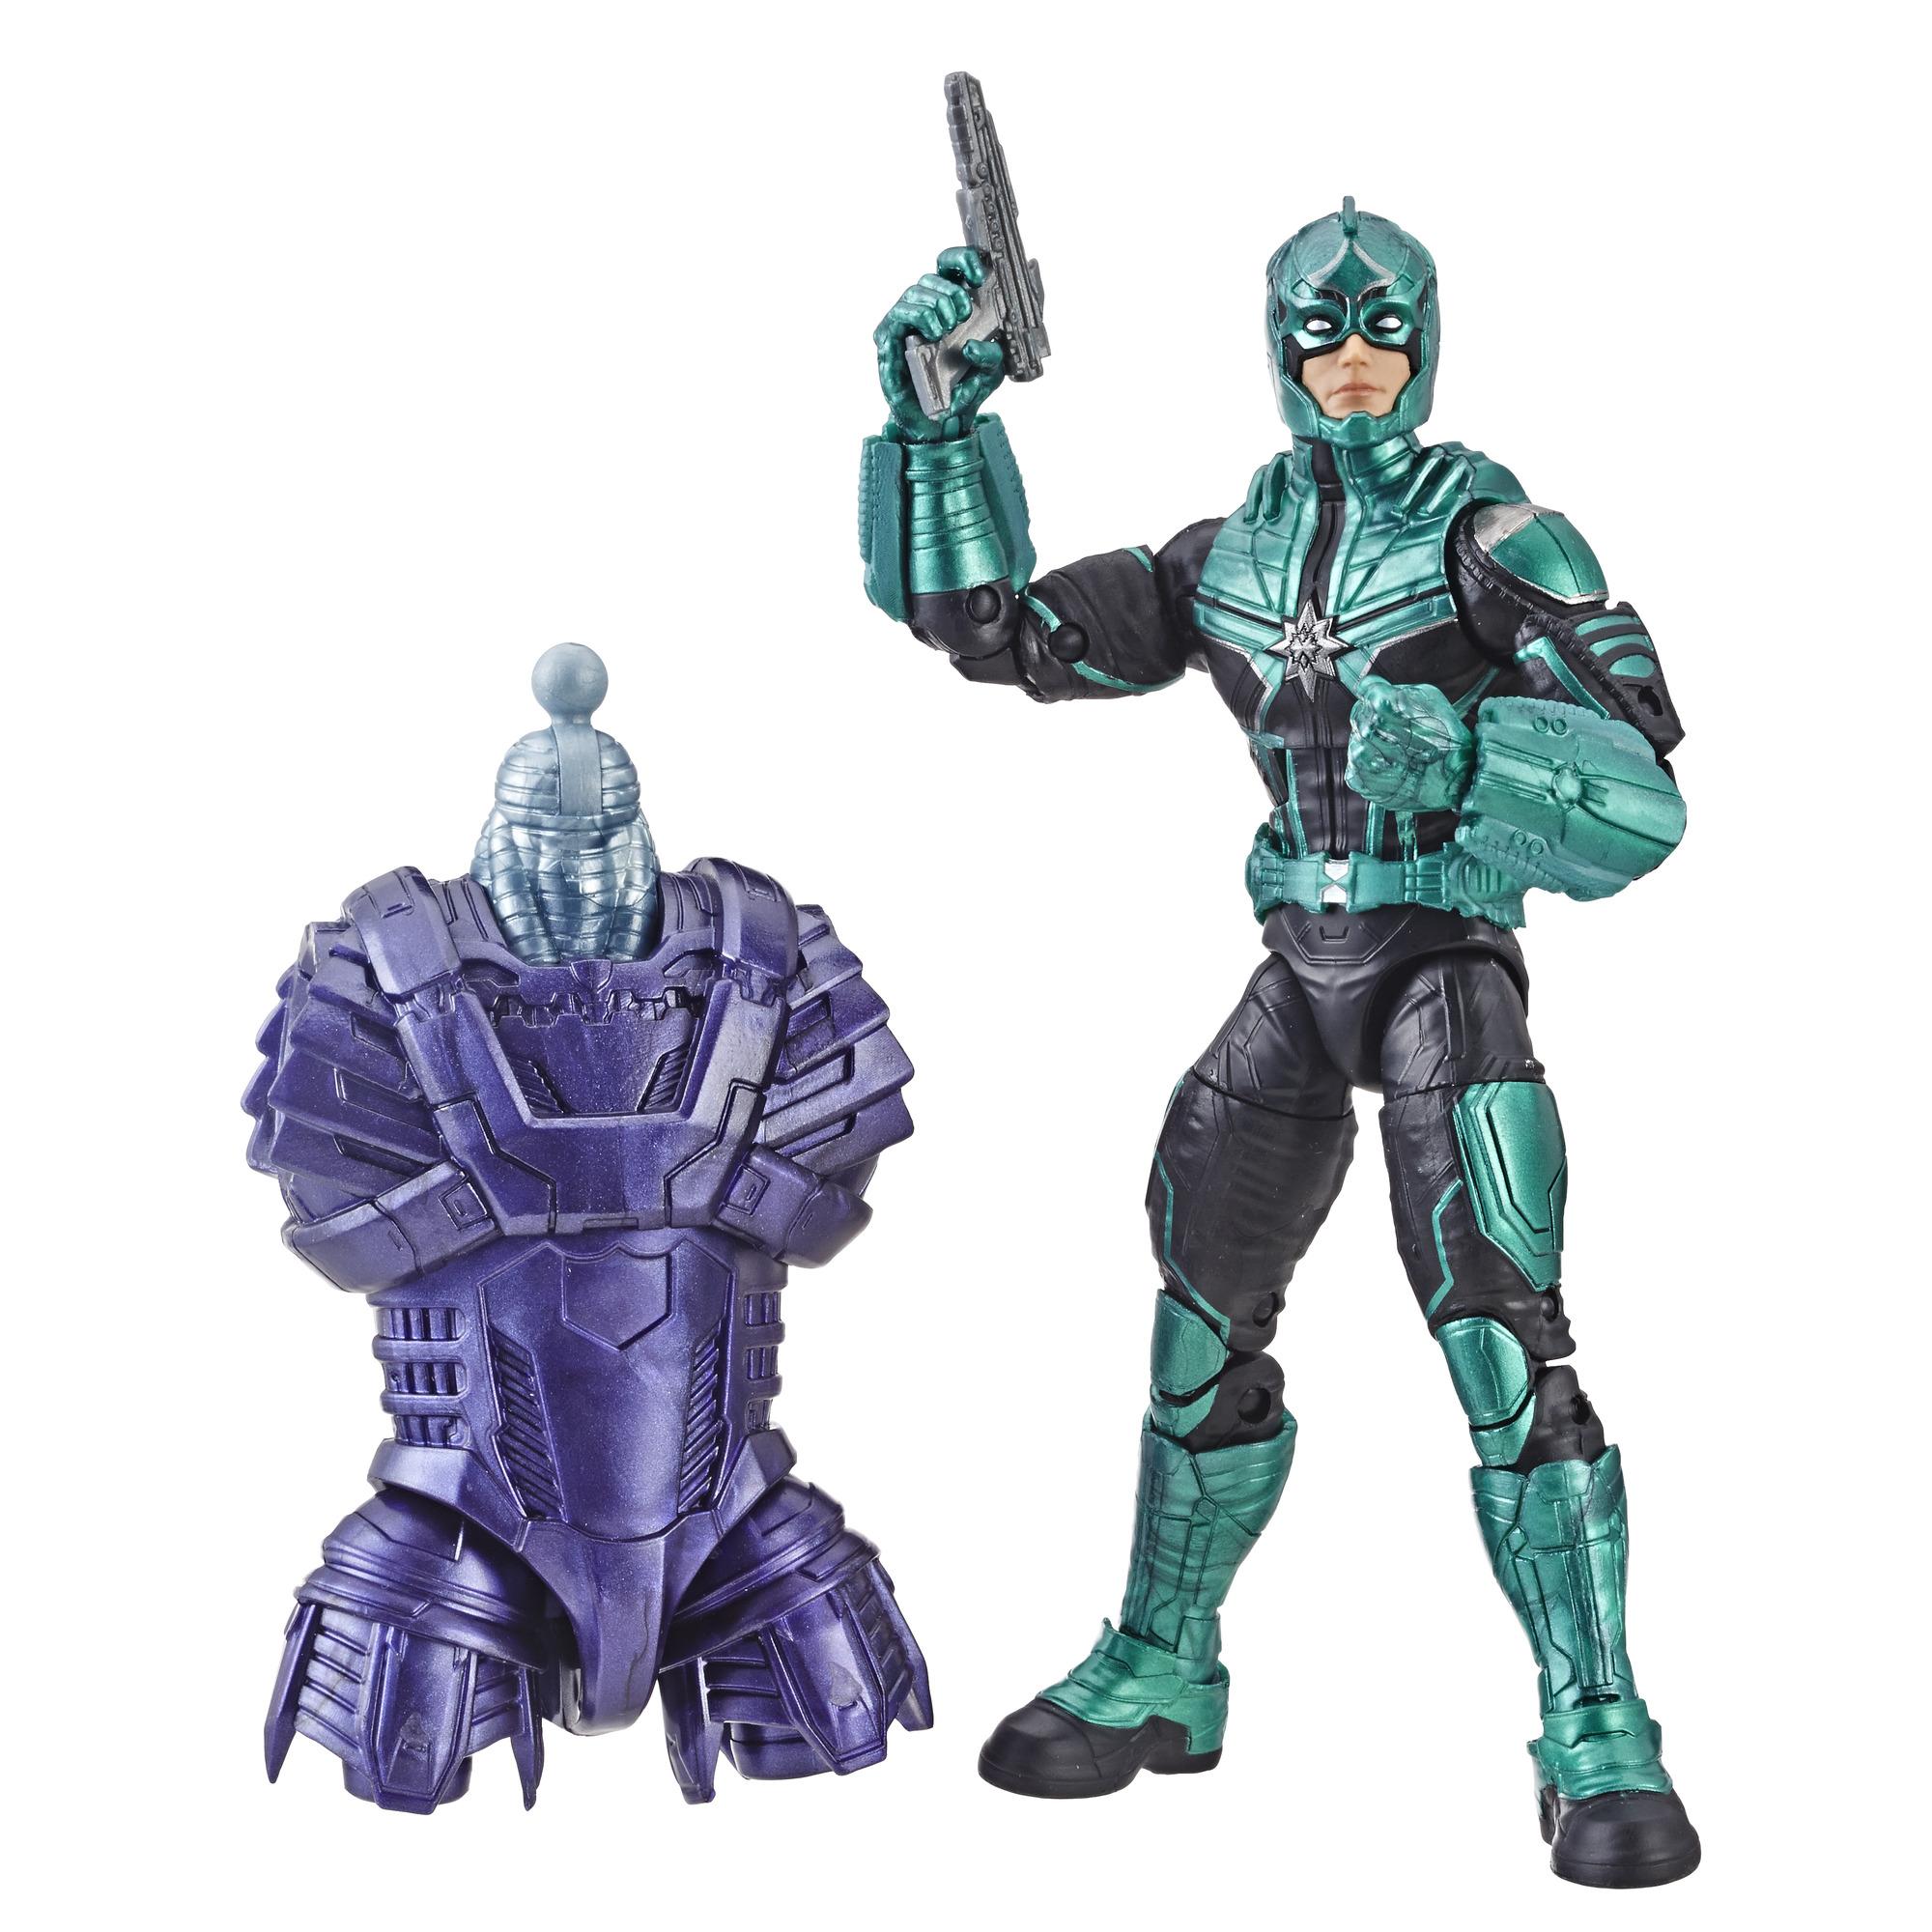 Marvel Captain Marvel Legends Yon-Rogg Kree Figure for Collectors